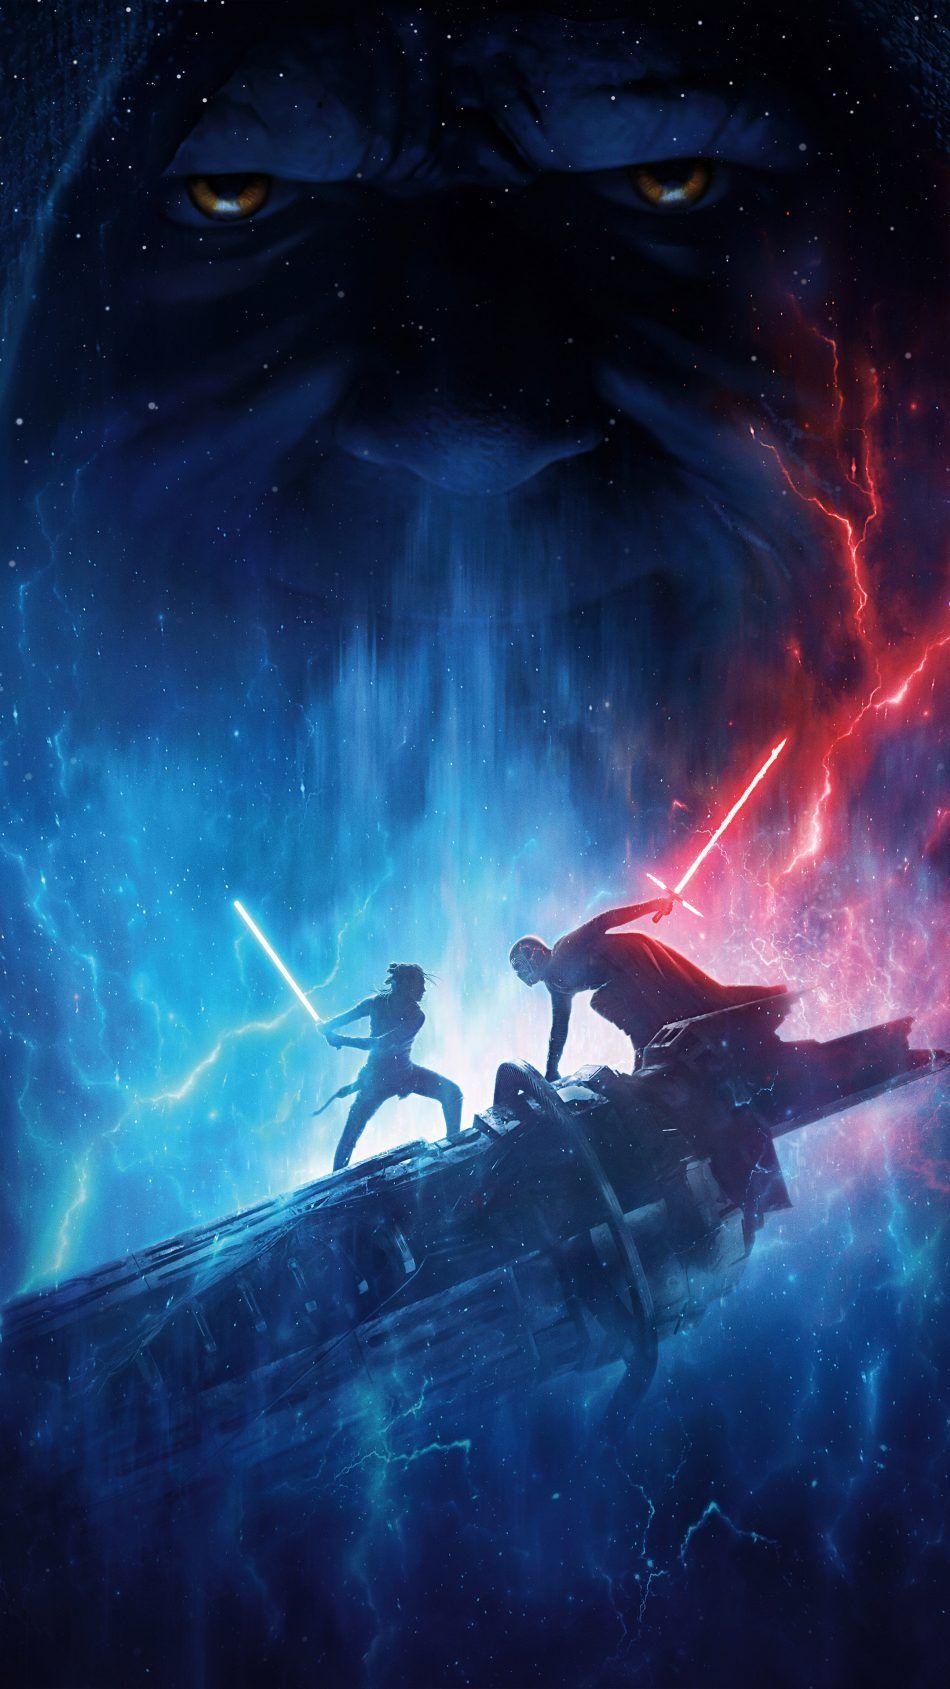 Star Wars Wallpaper 4k Pc